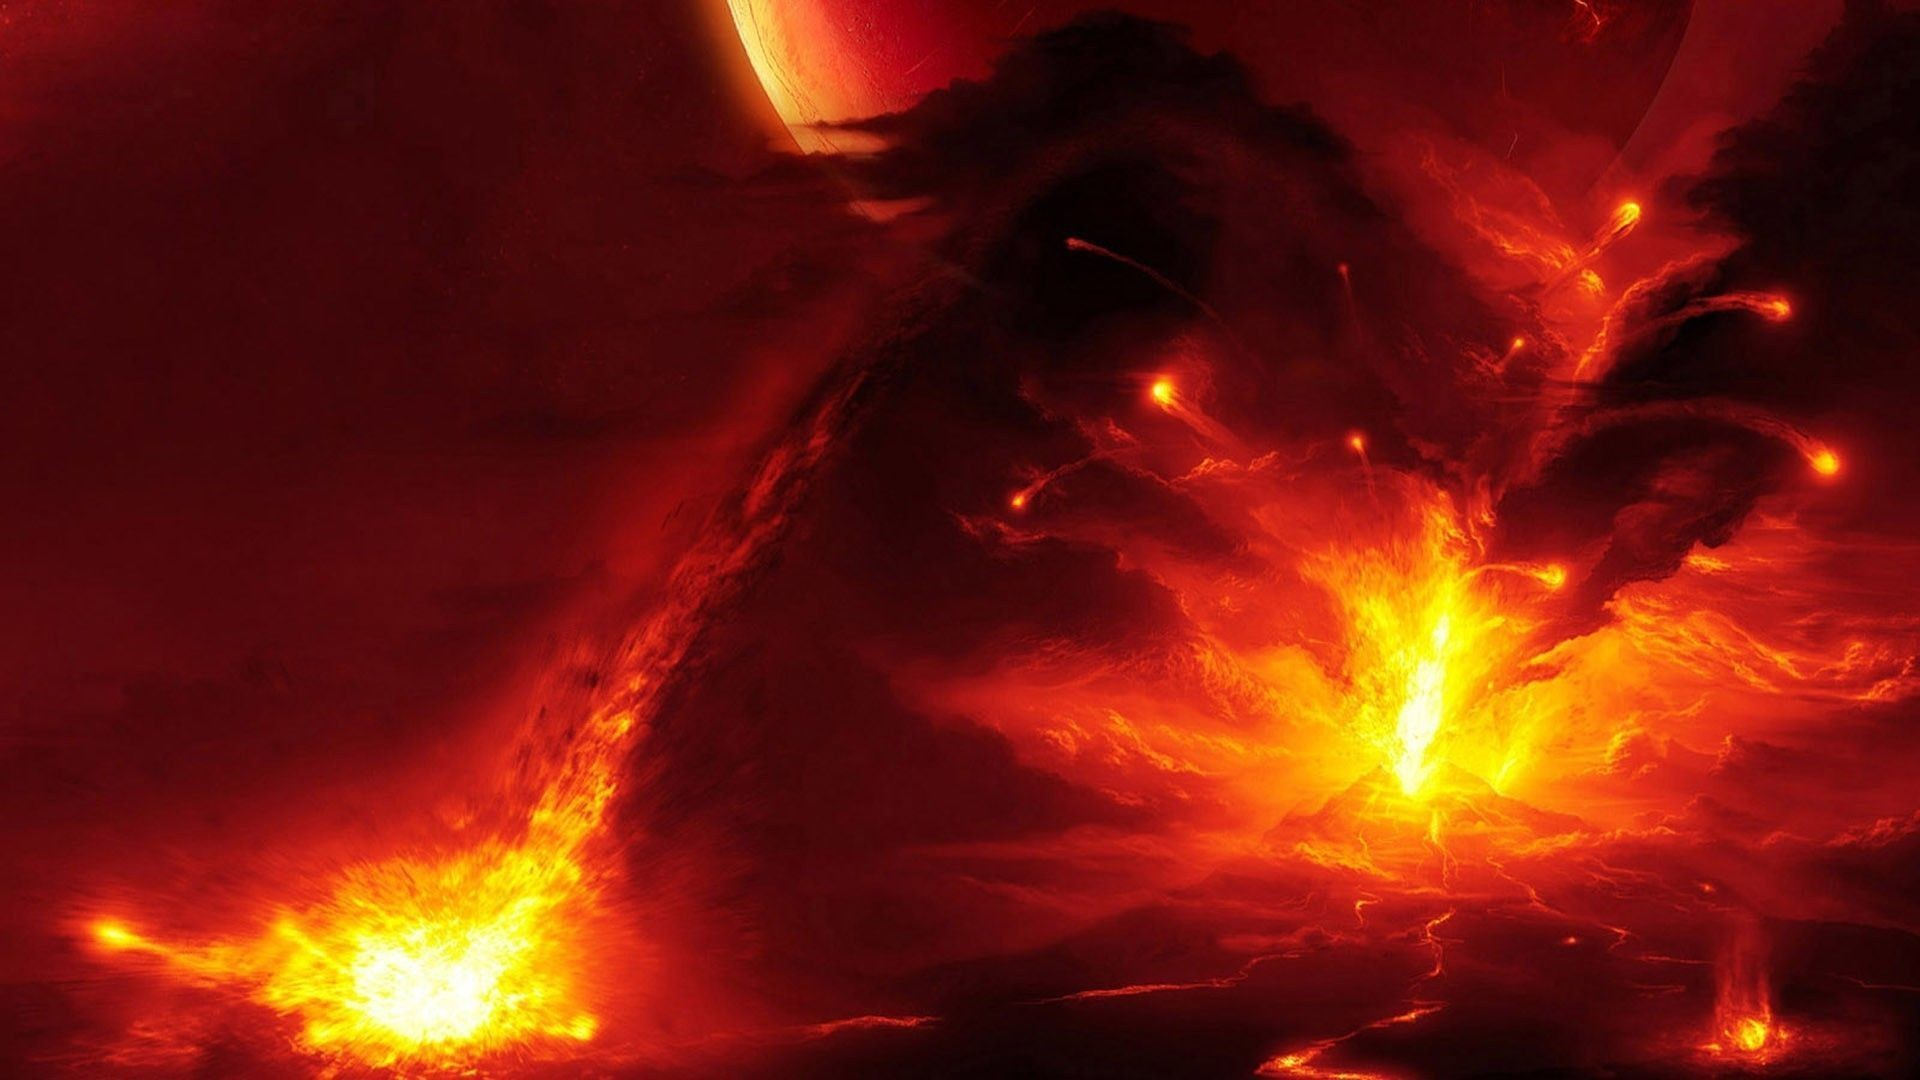 Volcanic Eruptions Landscape Wallpaper Photos #5143 Wallpaper .